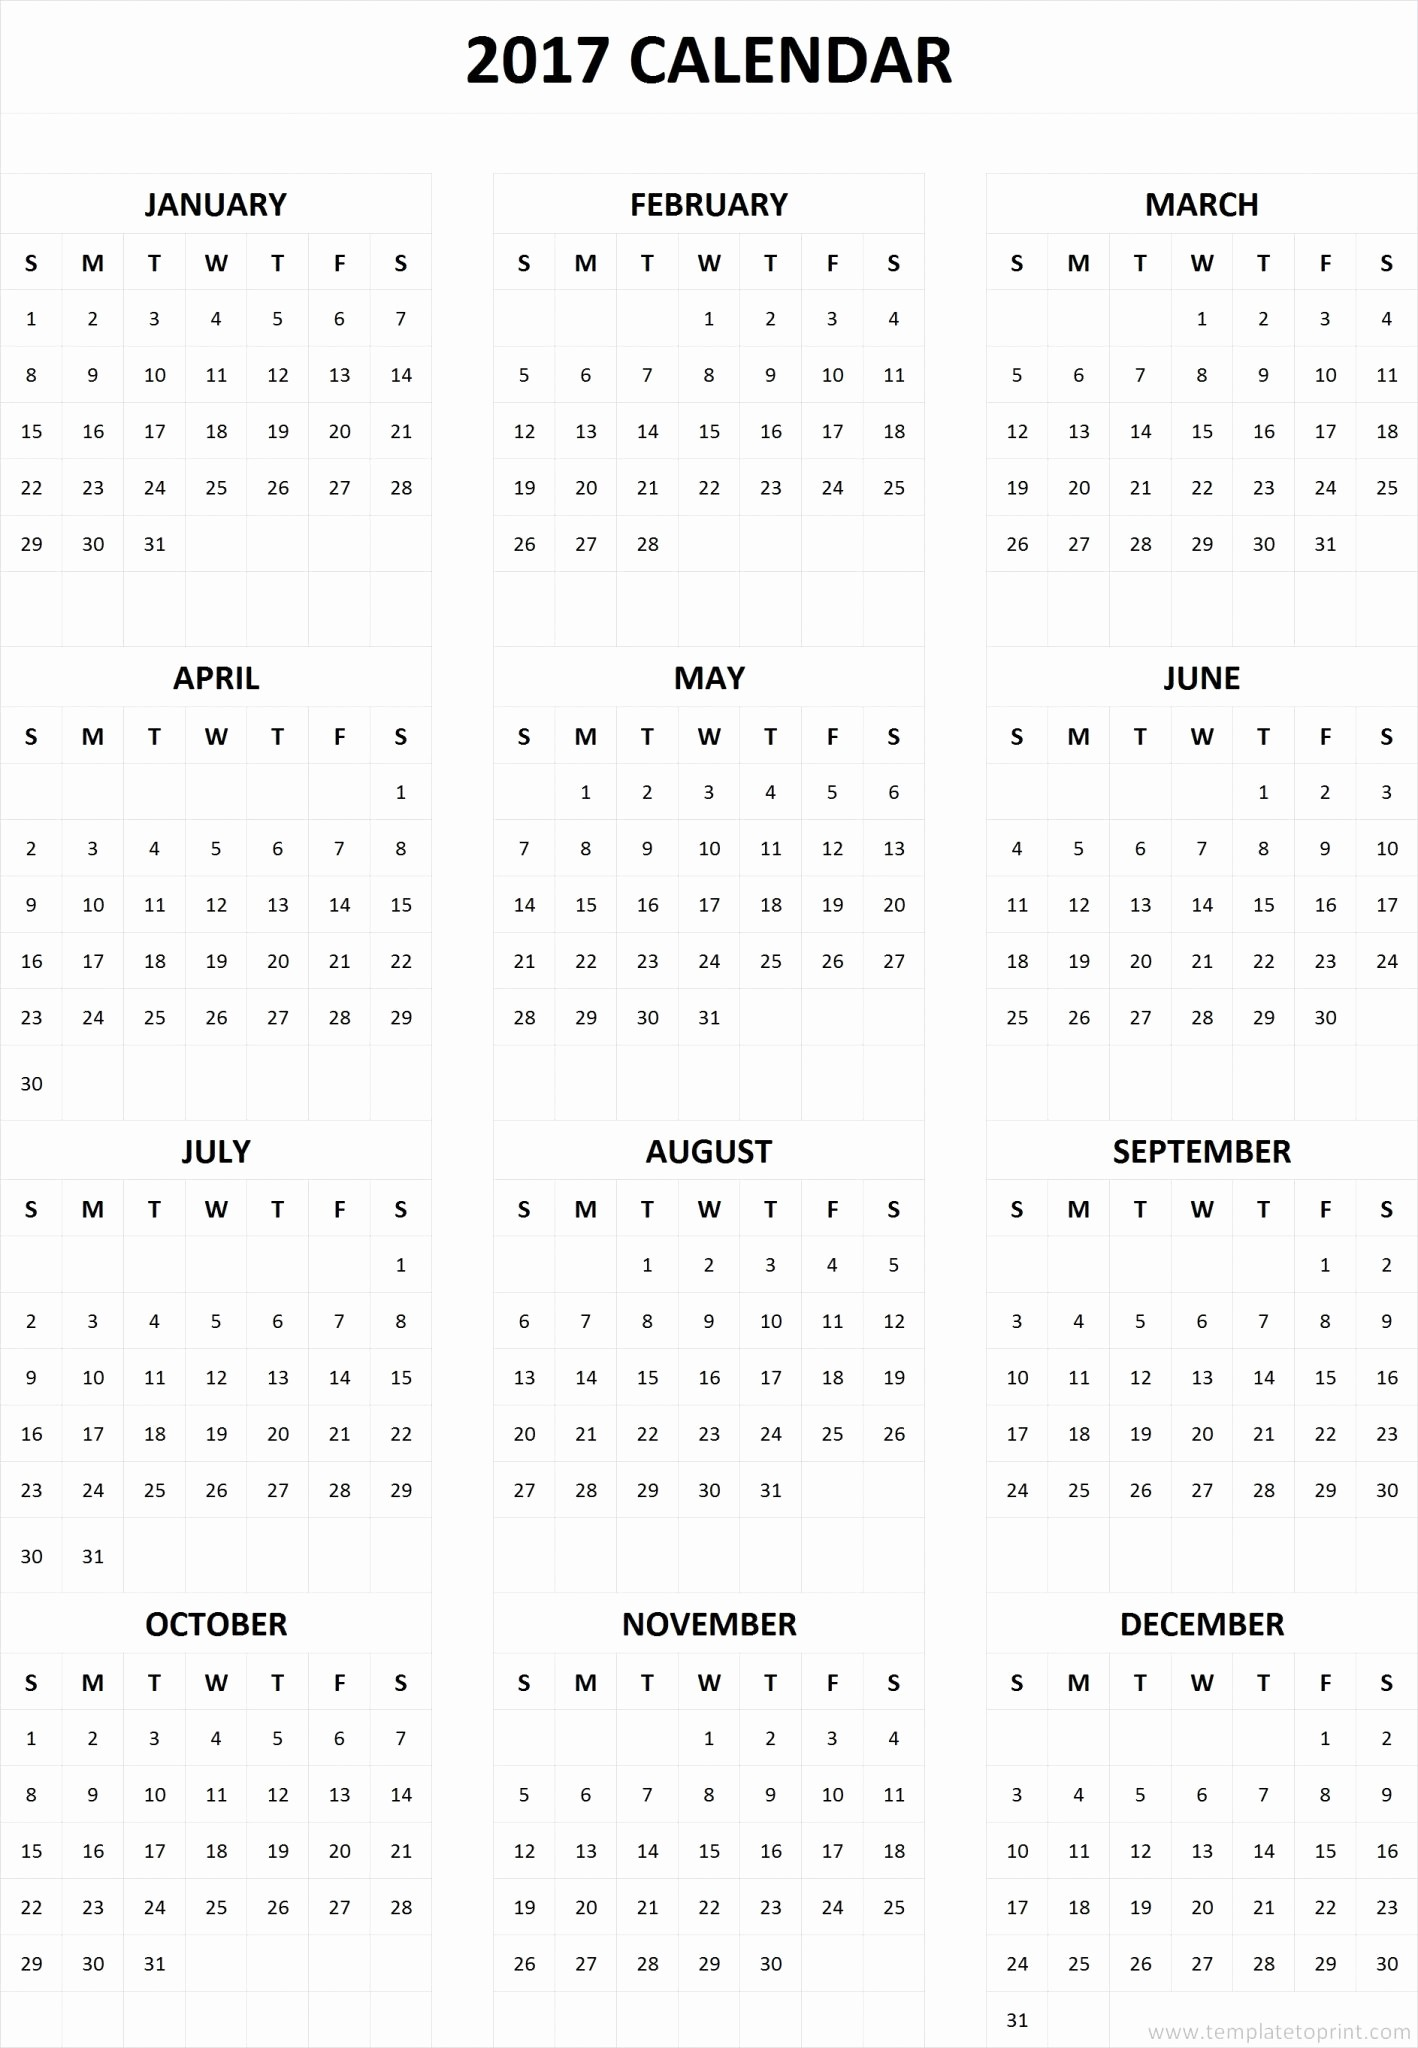 Free Printable Annual Calendar 2017 Unique 2017 Calendar E Page